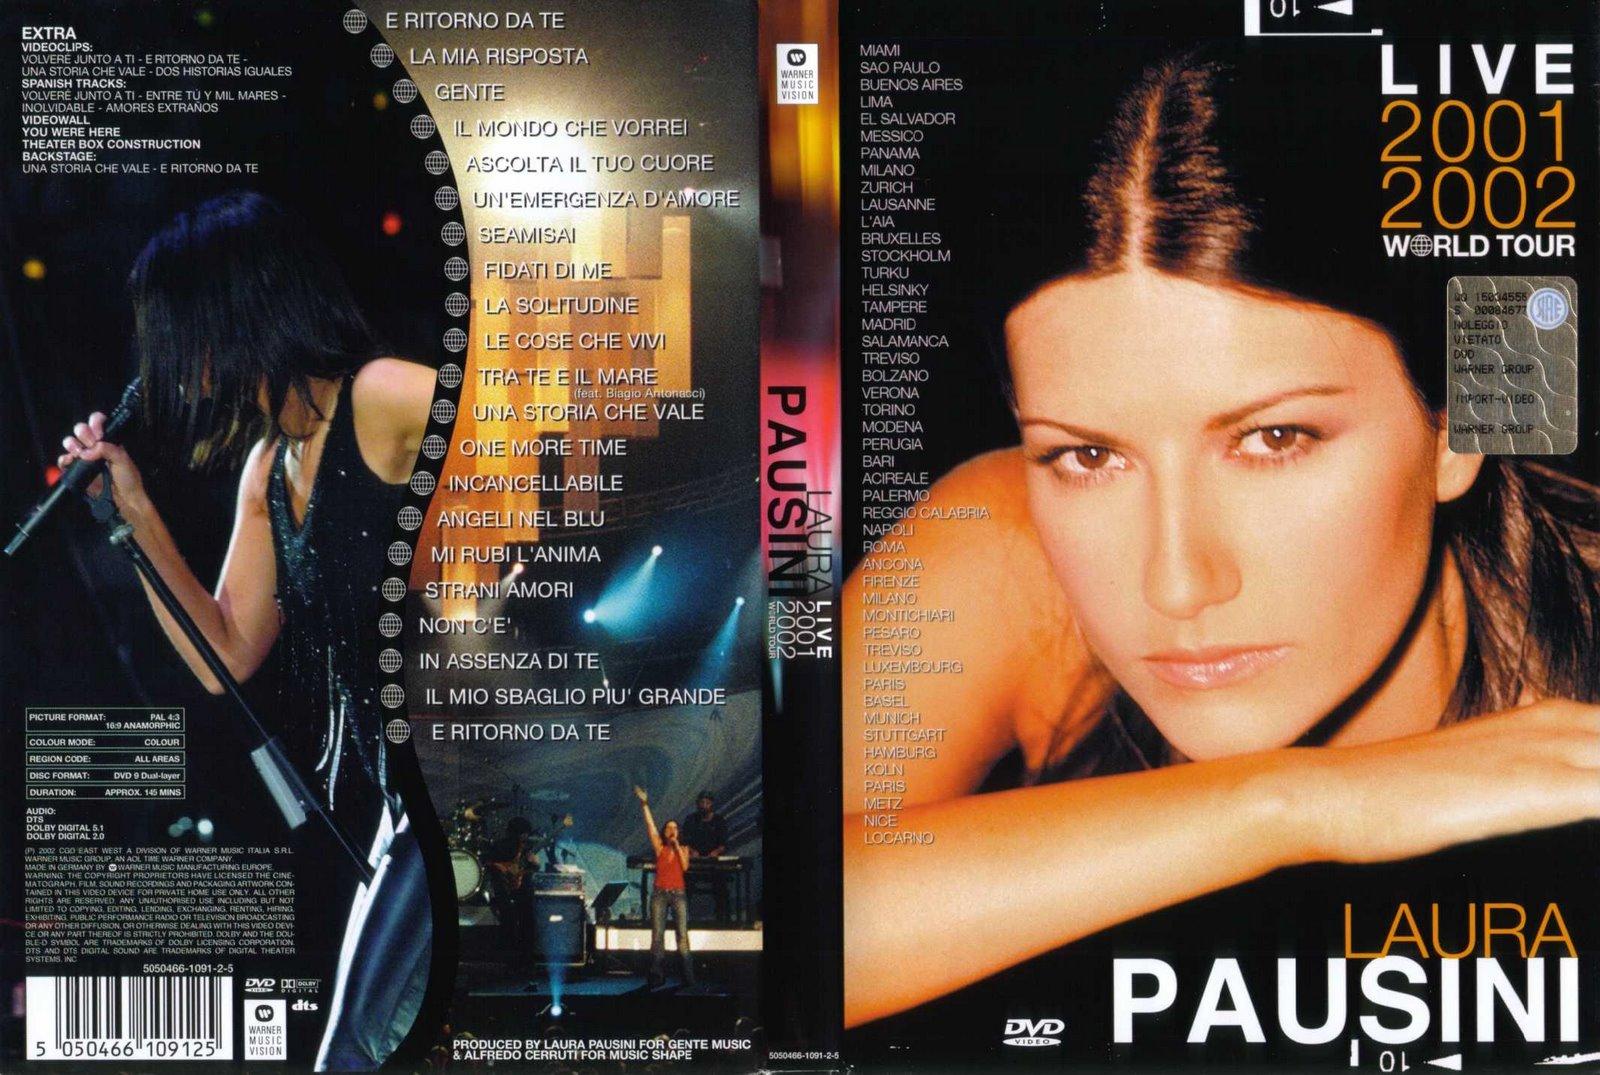 http://2.bp.blogspot.com/_brcl7Spzbn4/S98JaFJUTiI/AAAAAAAAAI0/5Vm_Z1NEDEk/s1600/Laura_Pausini_-_Live_2001-2002_World_Tour_-_Cover.jpg